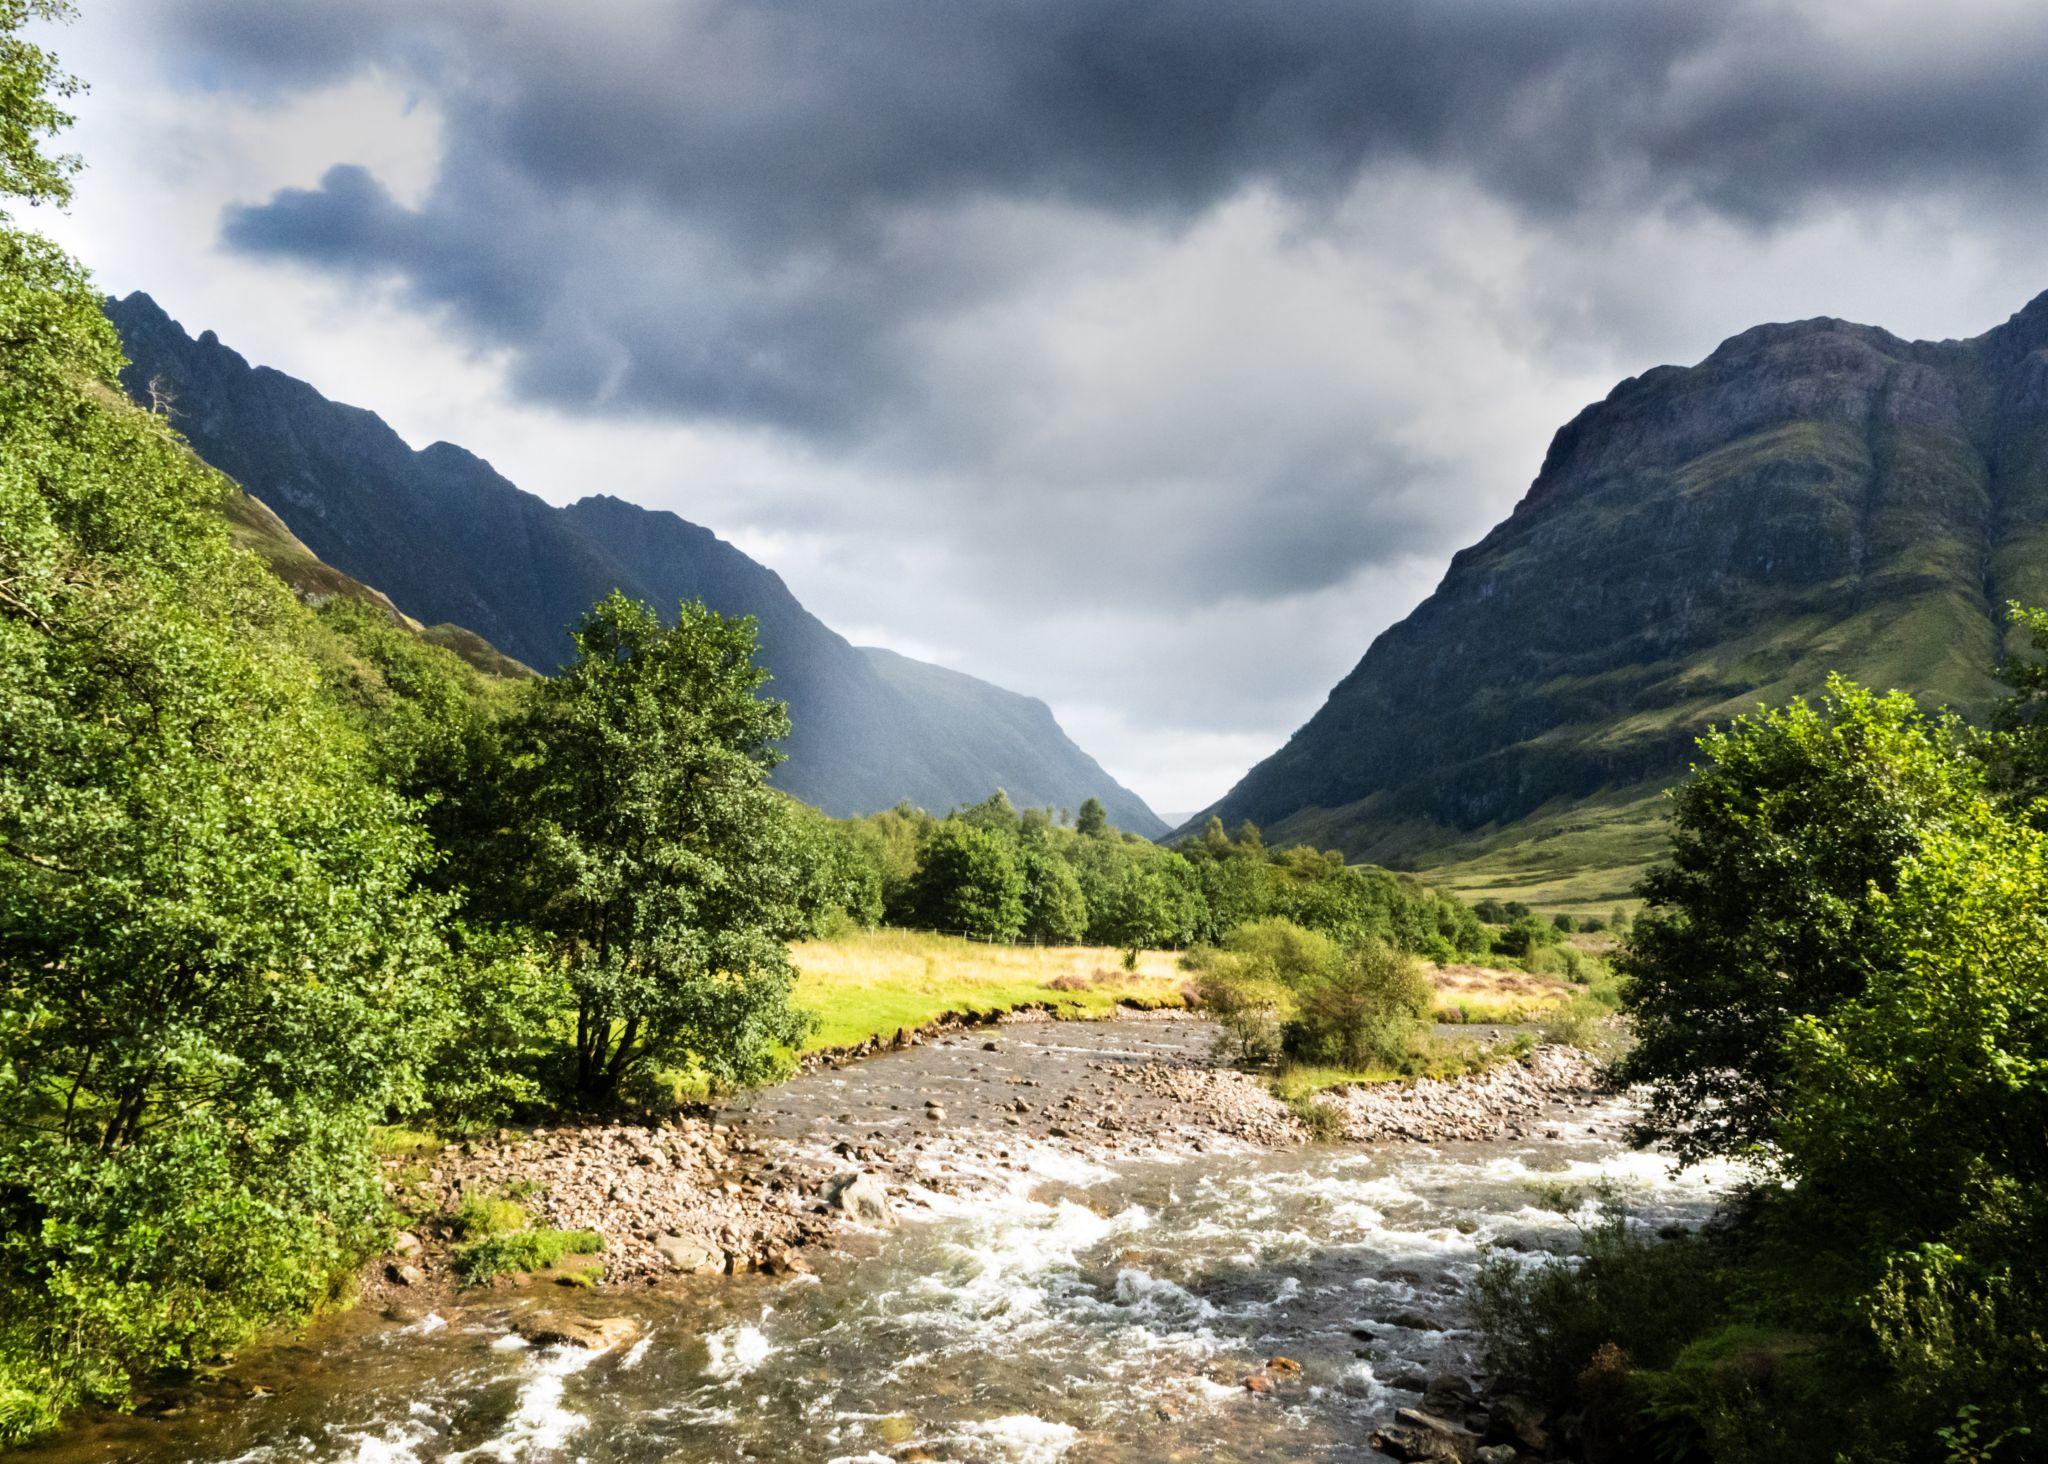 Glencoe river from Signal Rock, United Kingdom